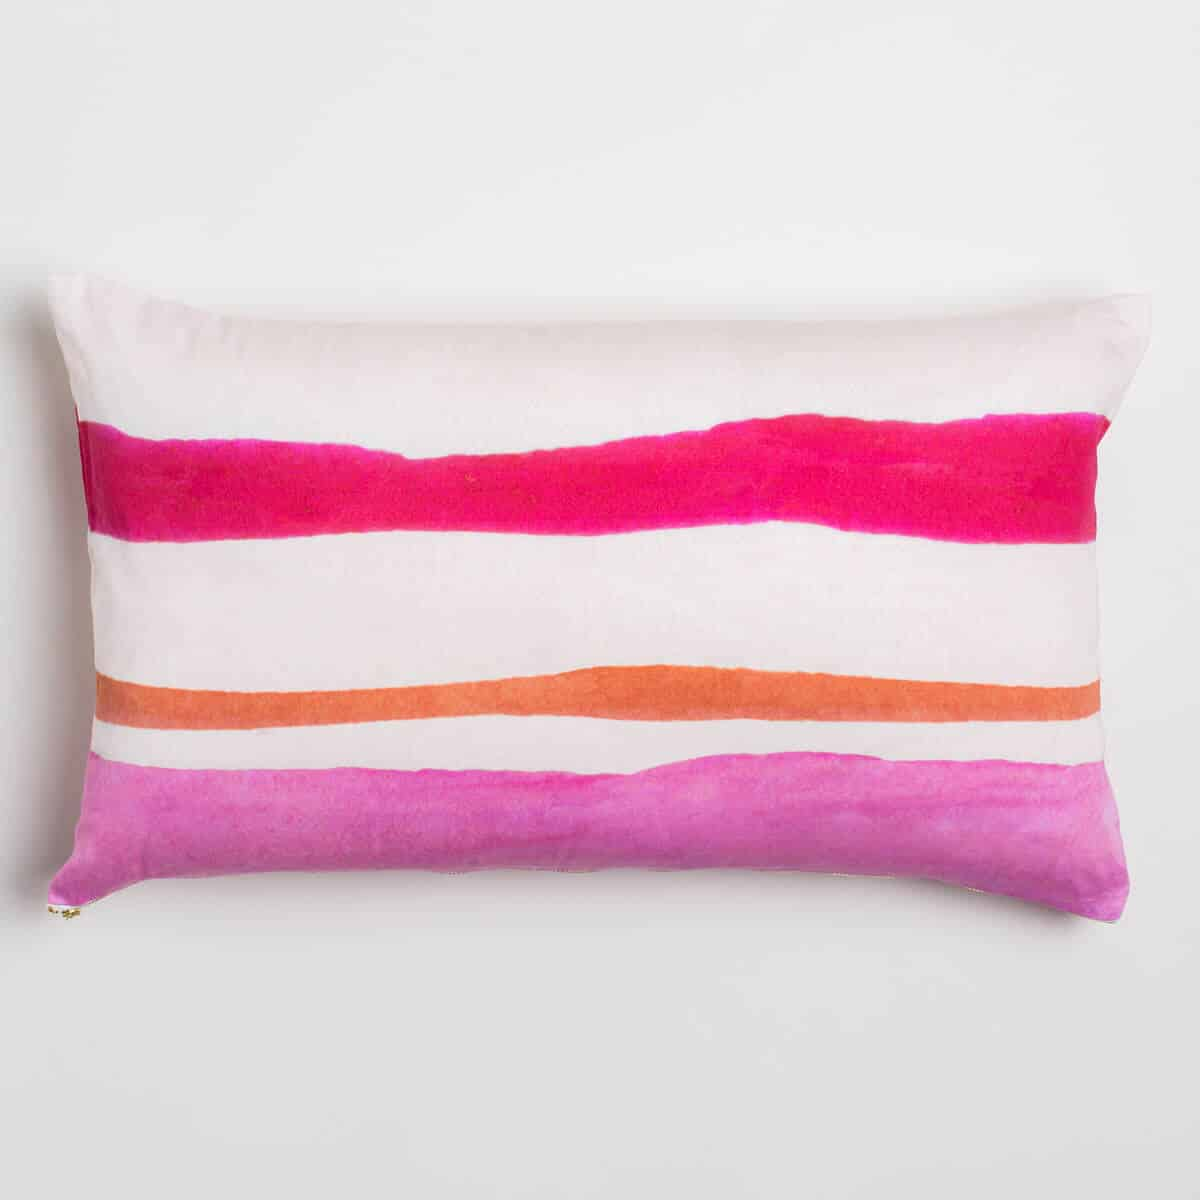 Luxury organic pink and orange watercolor stripe oblong lumber pillow